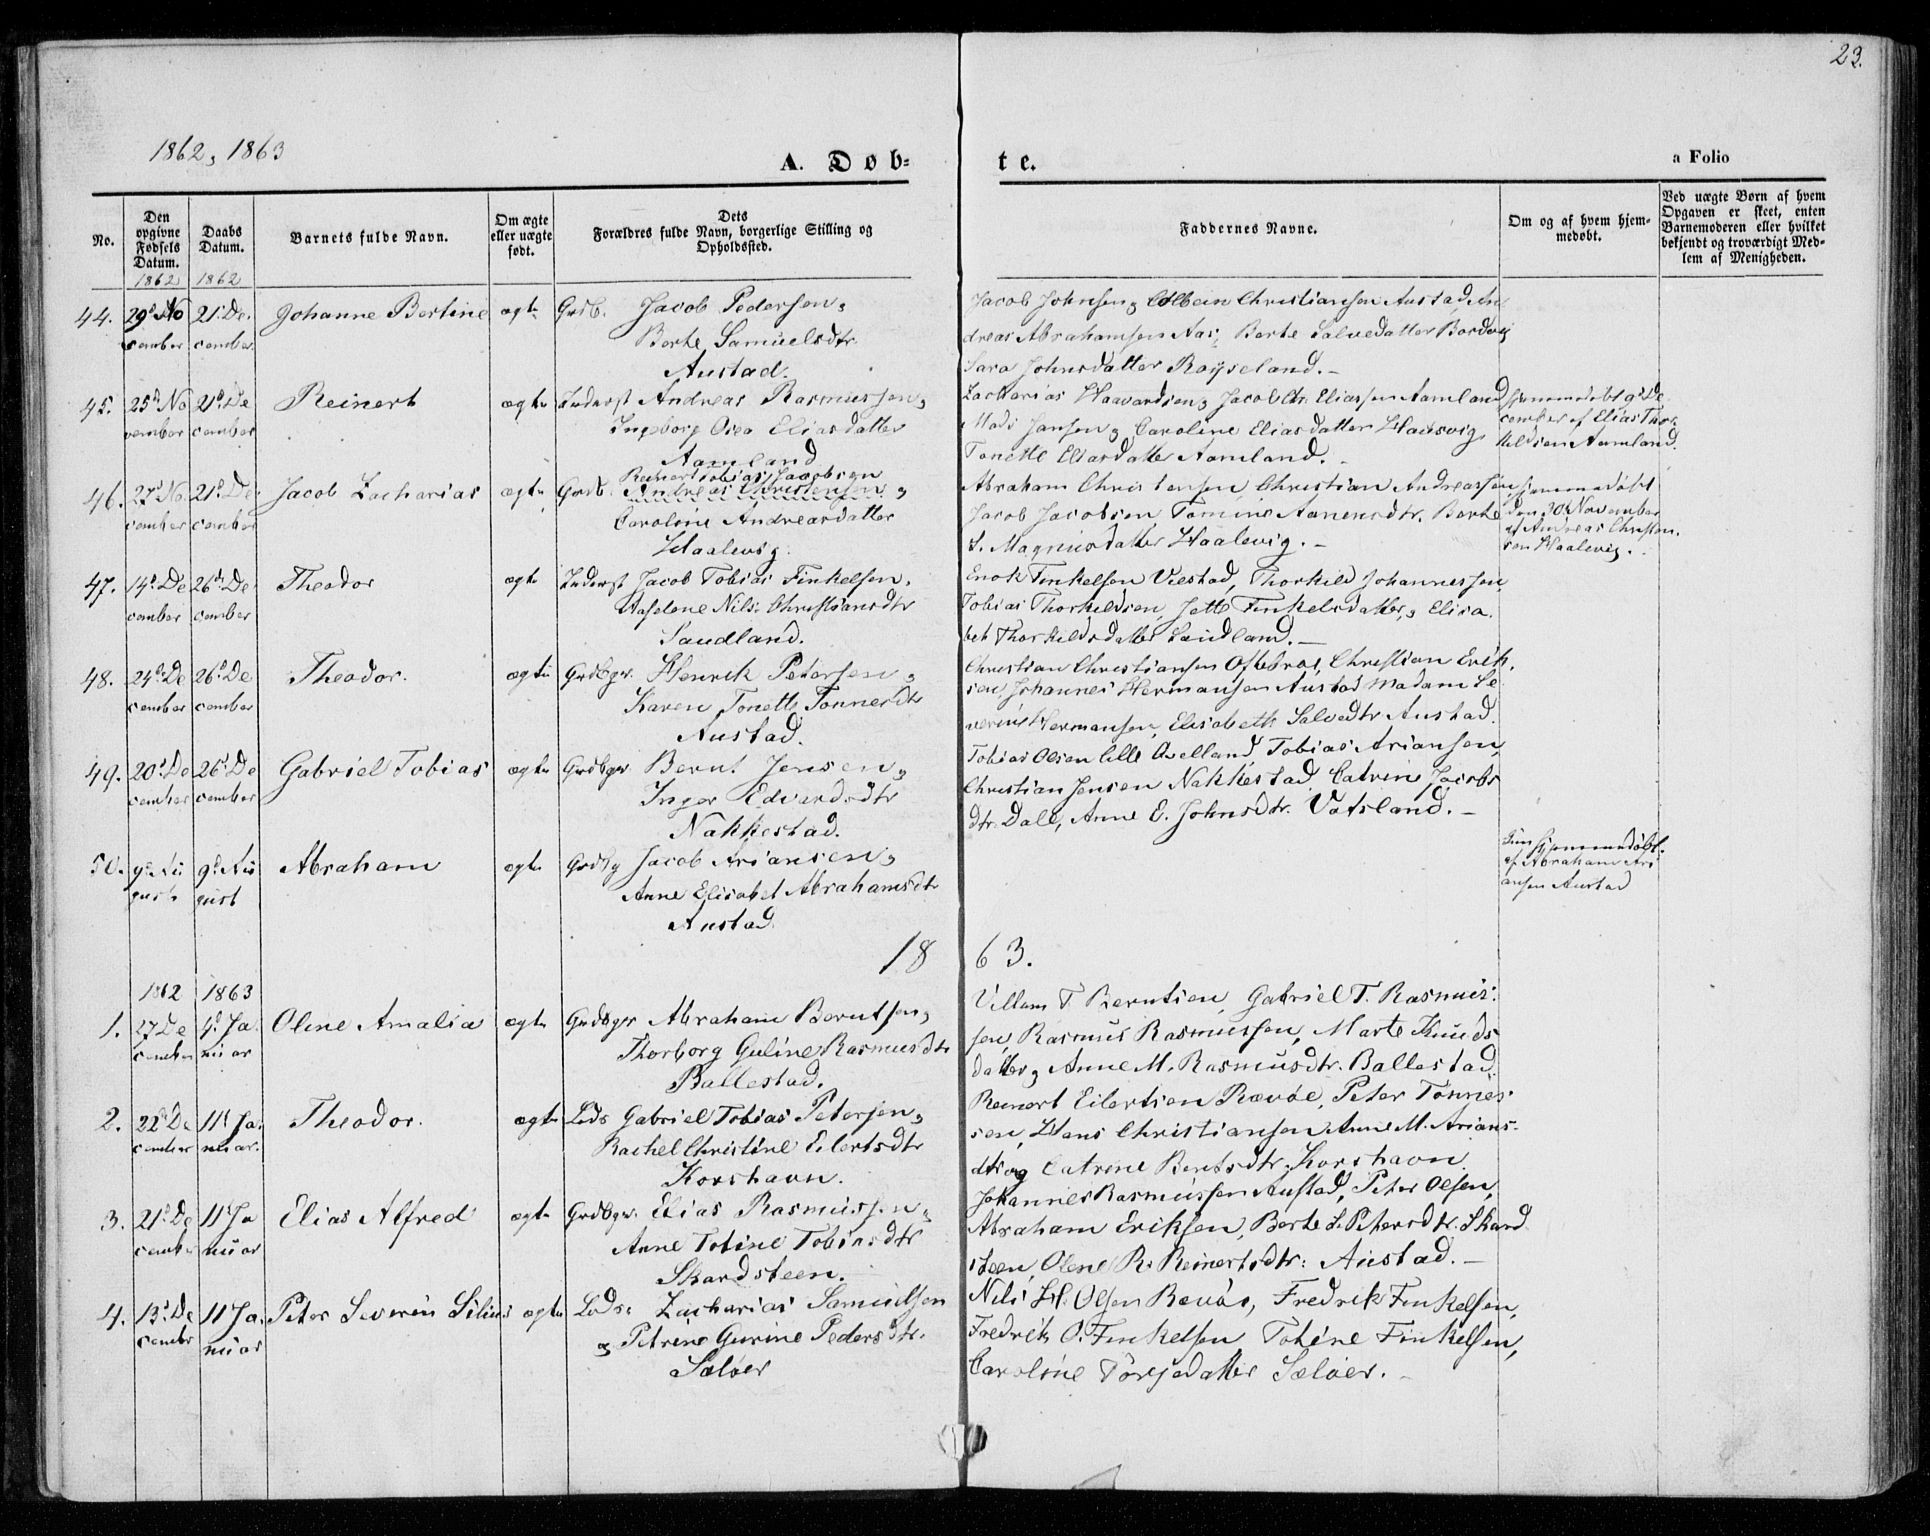 SAK, Lyngdal sokneprestkontor, F/Fa/Faa/L0002: Ministerialbok nr. A 2, 1858-1870, s. 23